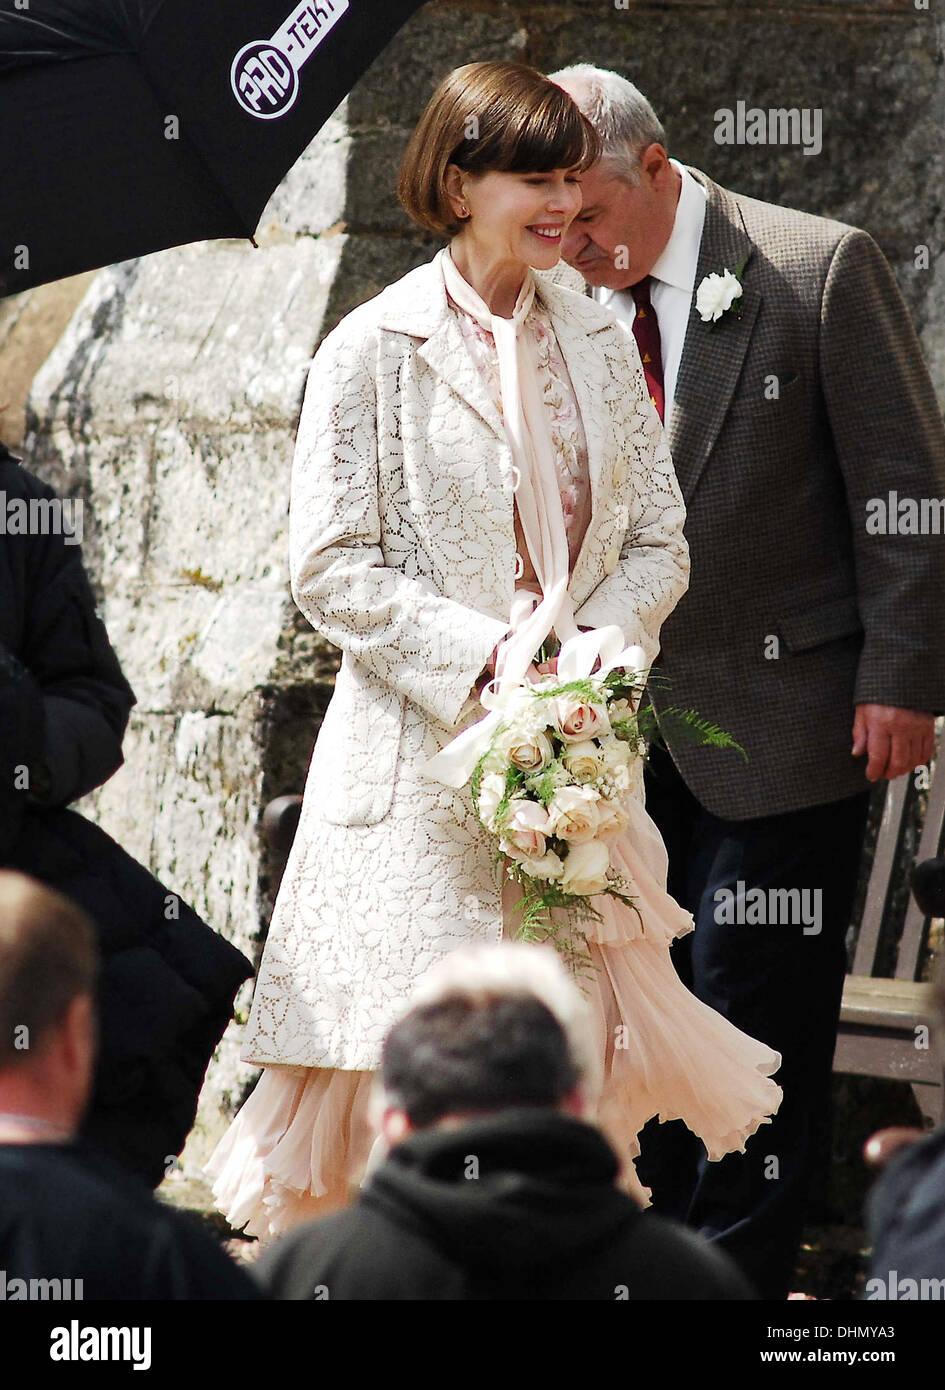 Nicole Kidman Filming A Wedding Scene Of The New Movie The Railway